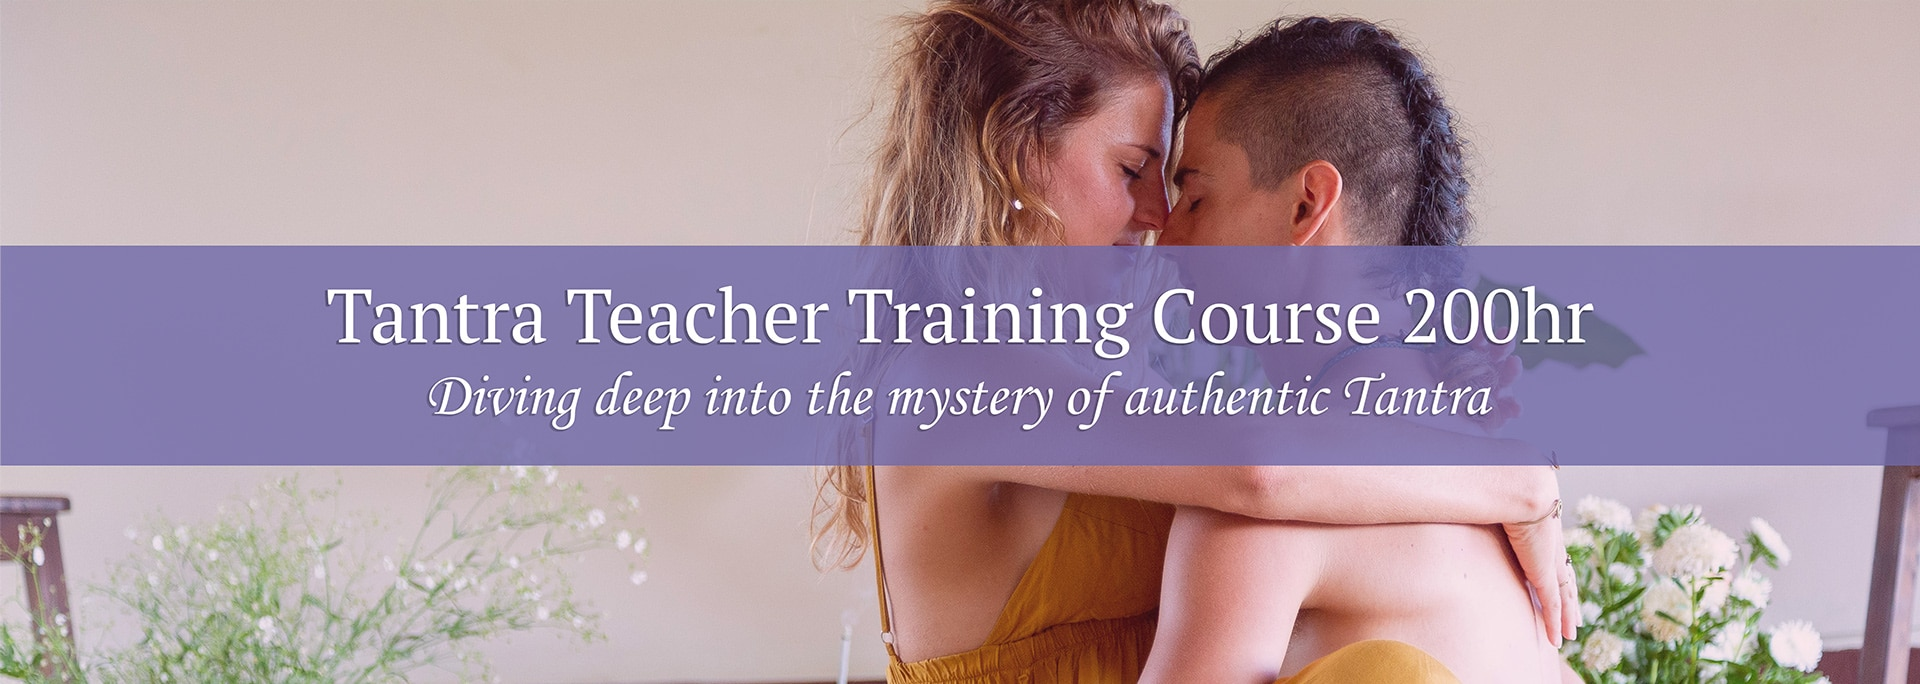 Tantra Teacher Training Course 200 hours